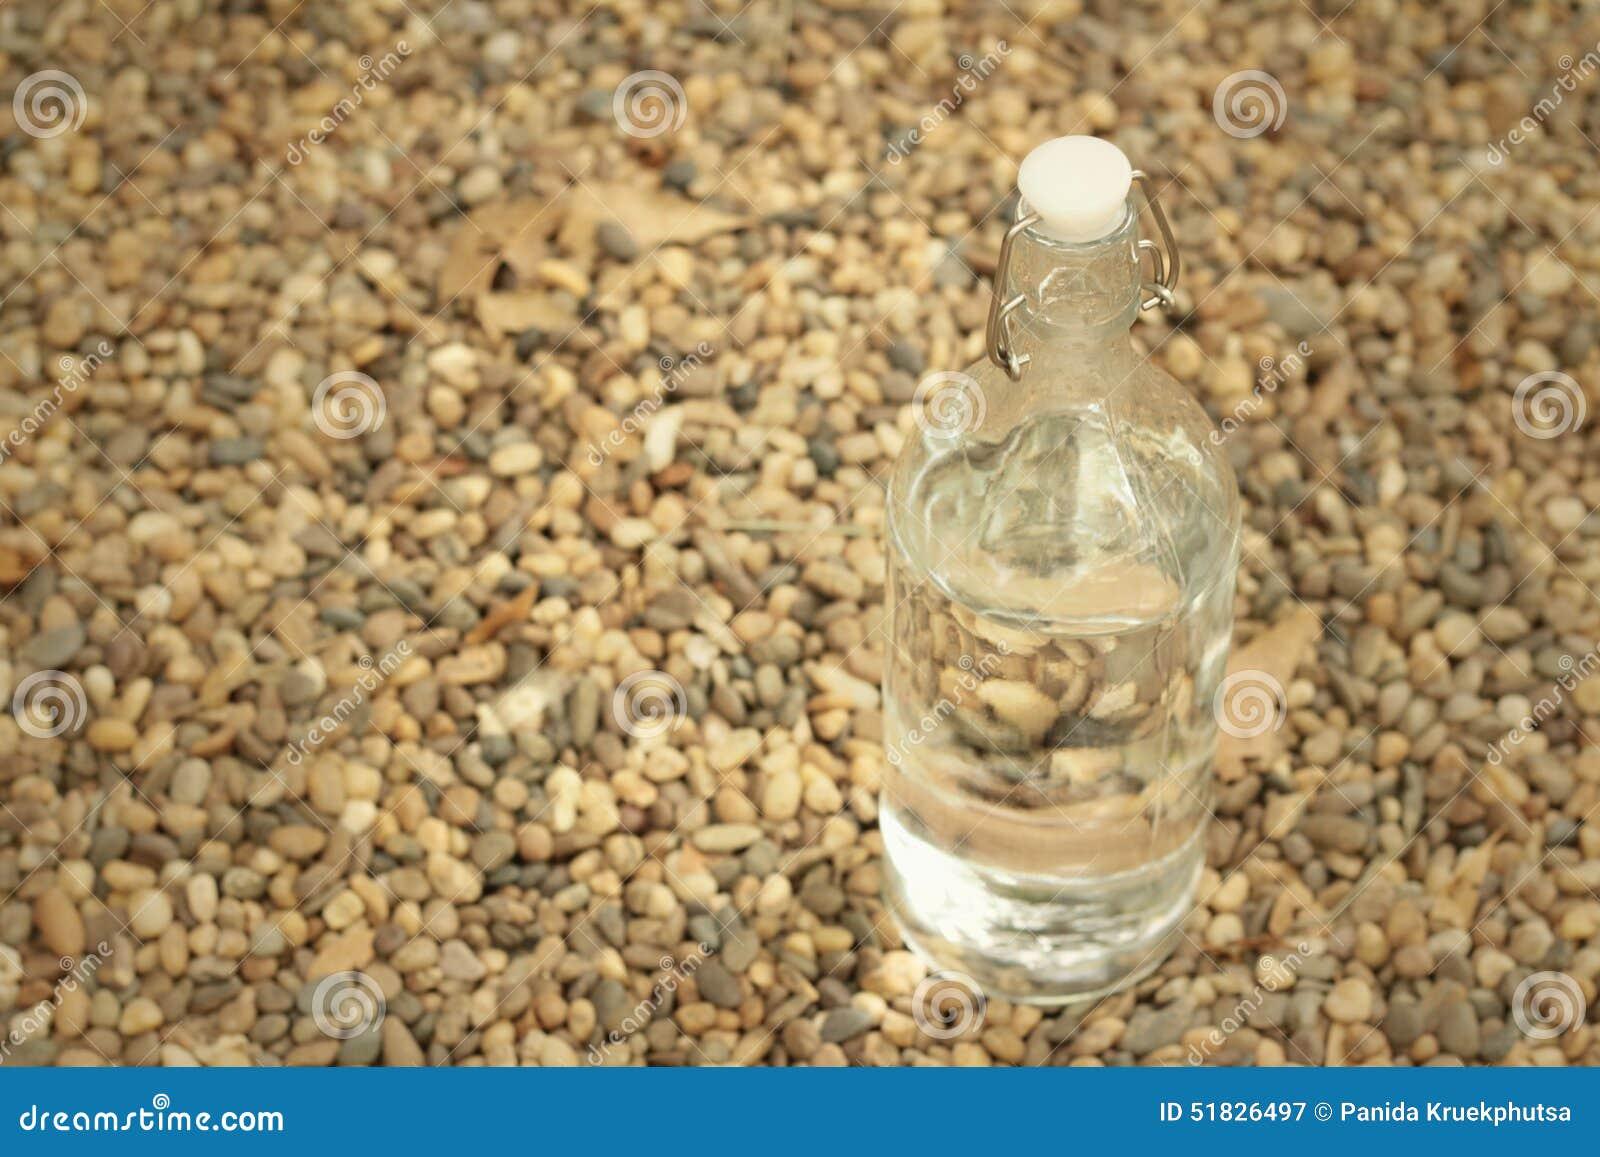 Filtered Water Bottle Best Buy